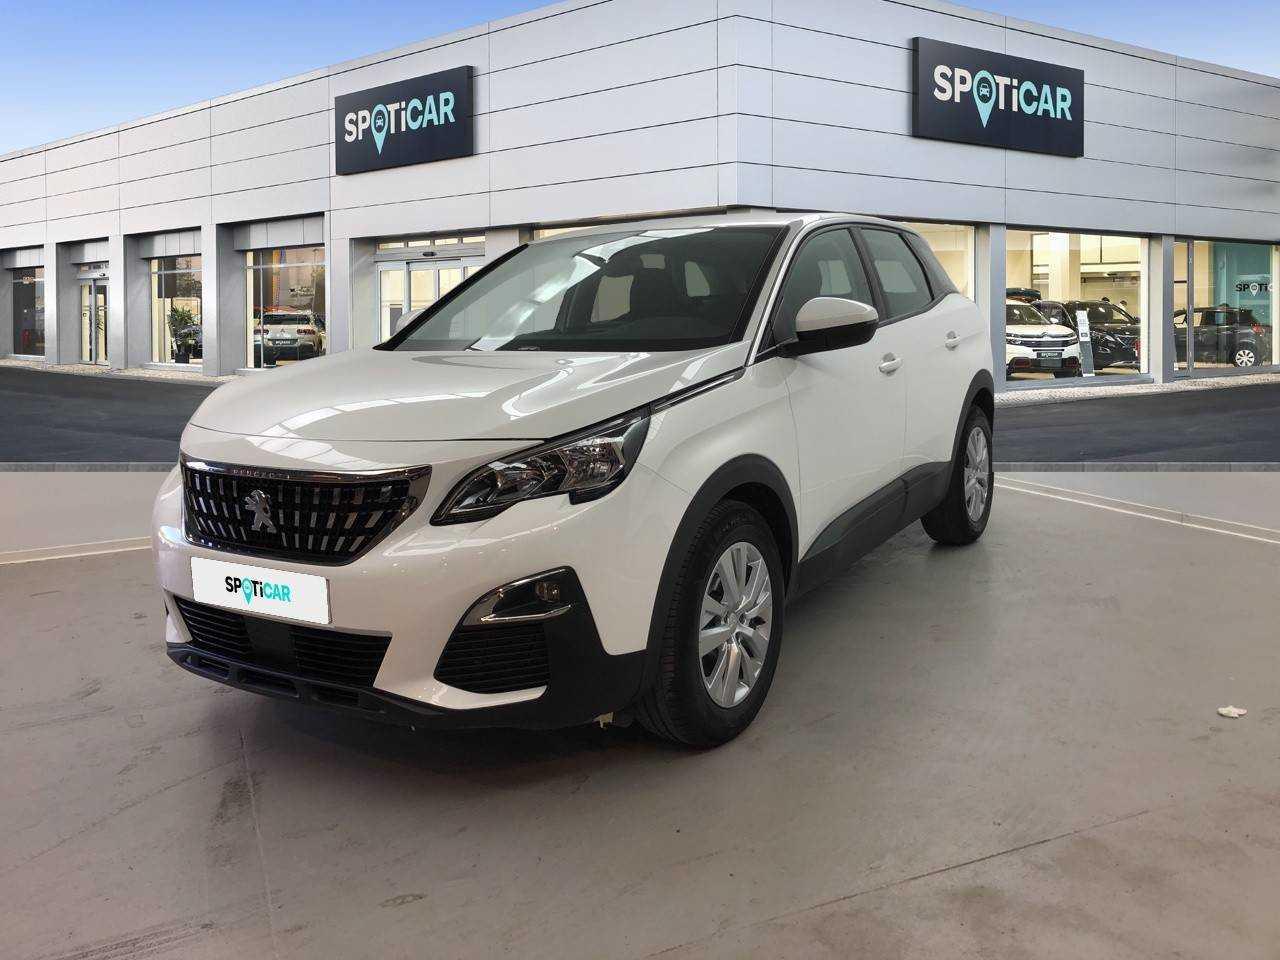 Peugeot 3008 ocasión segunda mano 2019 Diésel por 23.900€ en Sevilla